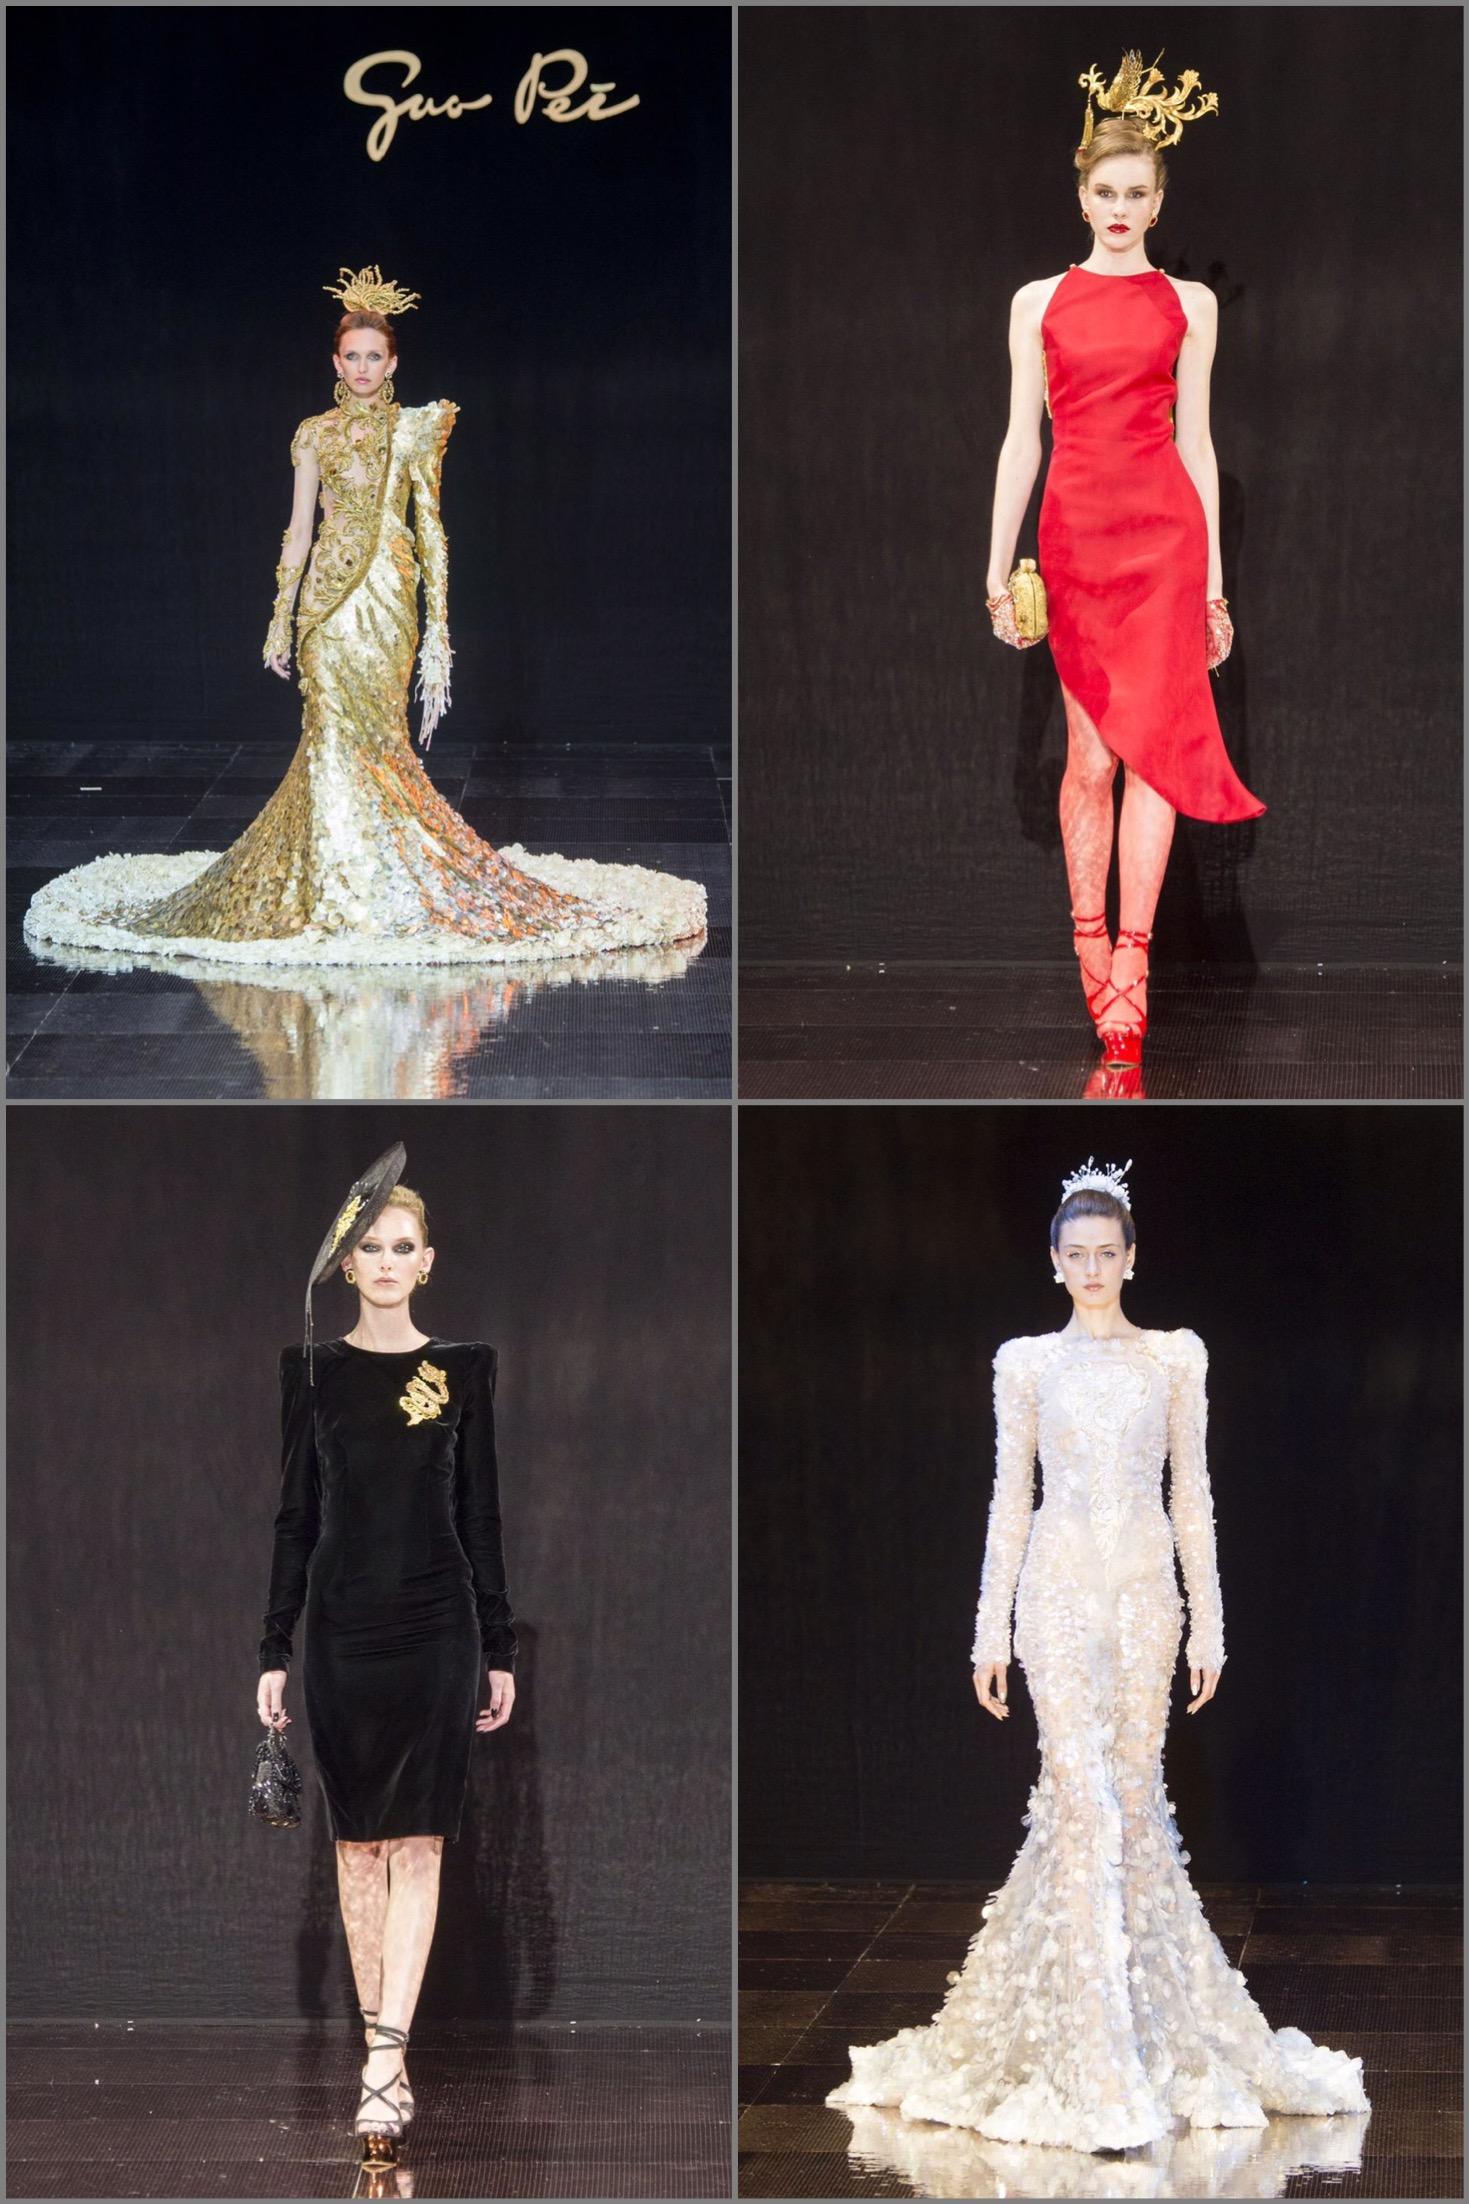 Paris Couture Week Fall Winter 2016-2017 - Guo Pei